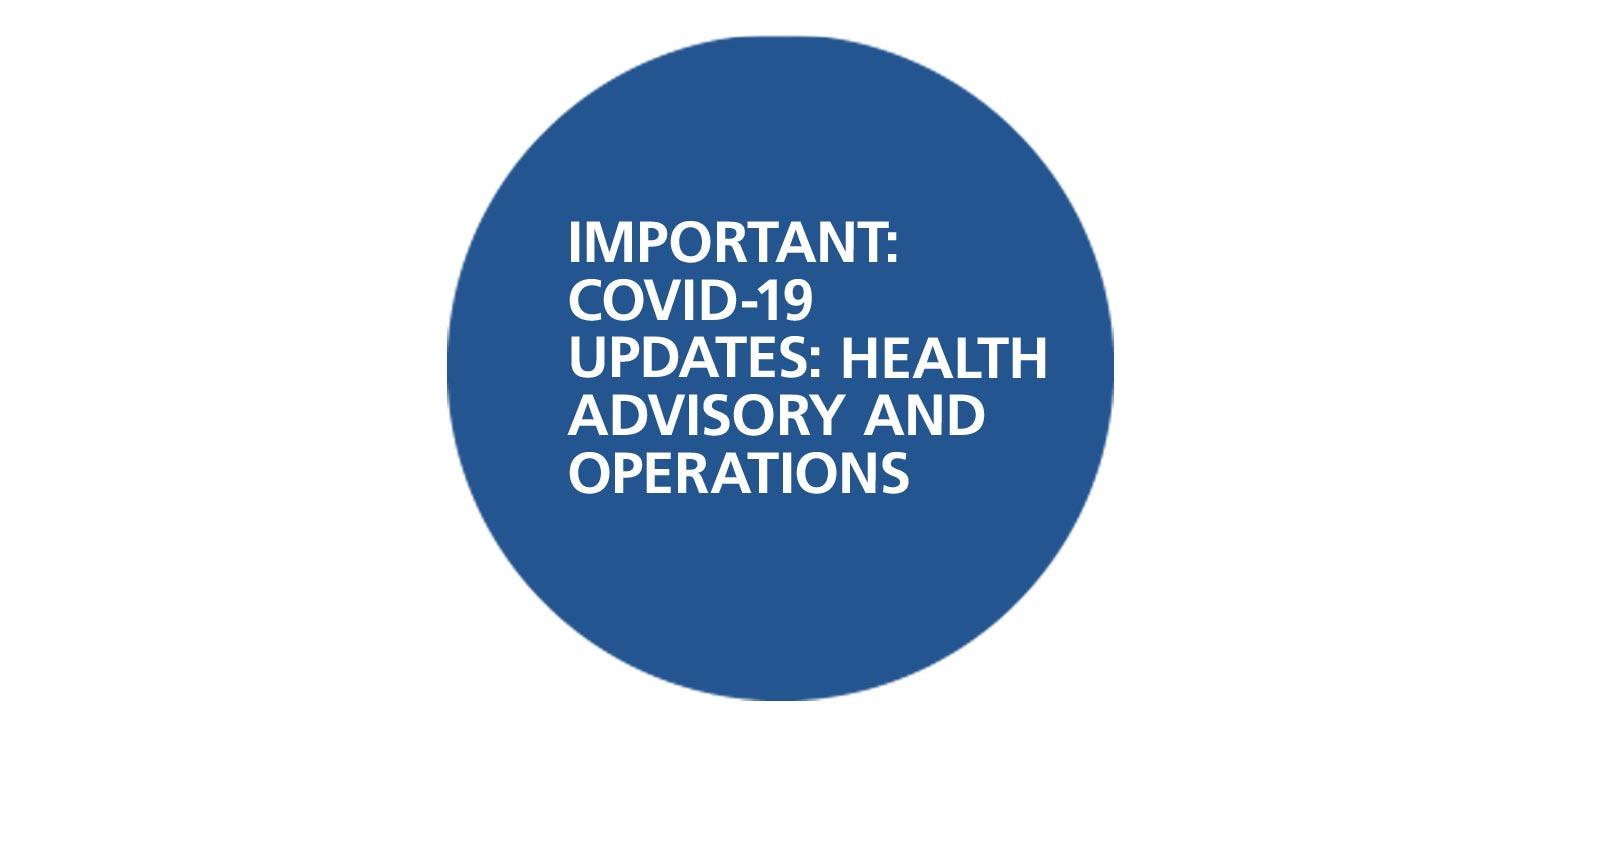 Coronavirus-updates-ialf-indonesia-important-news-jakarta-surabaya-bali